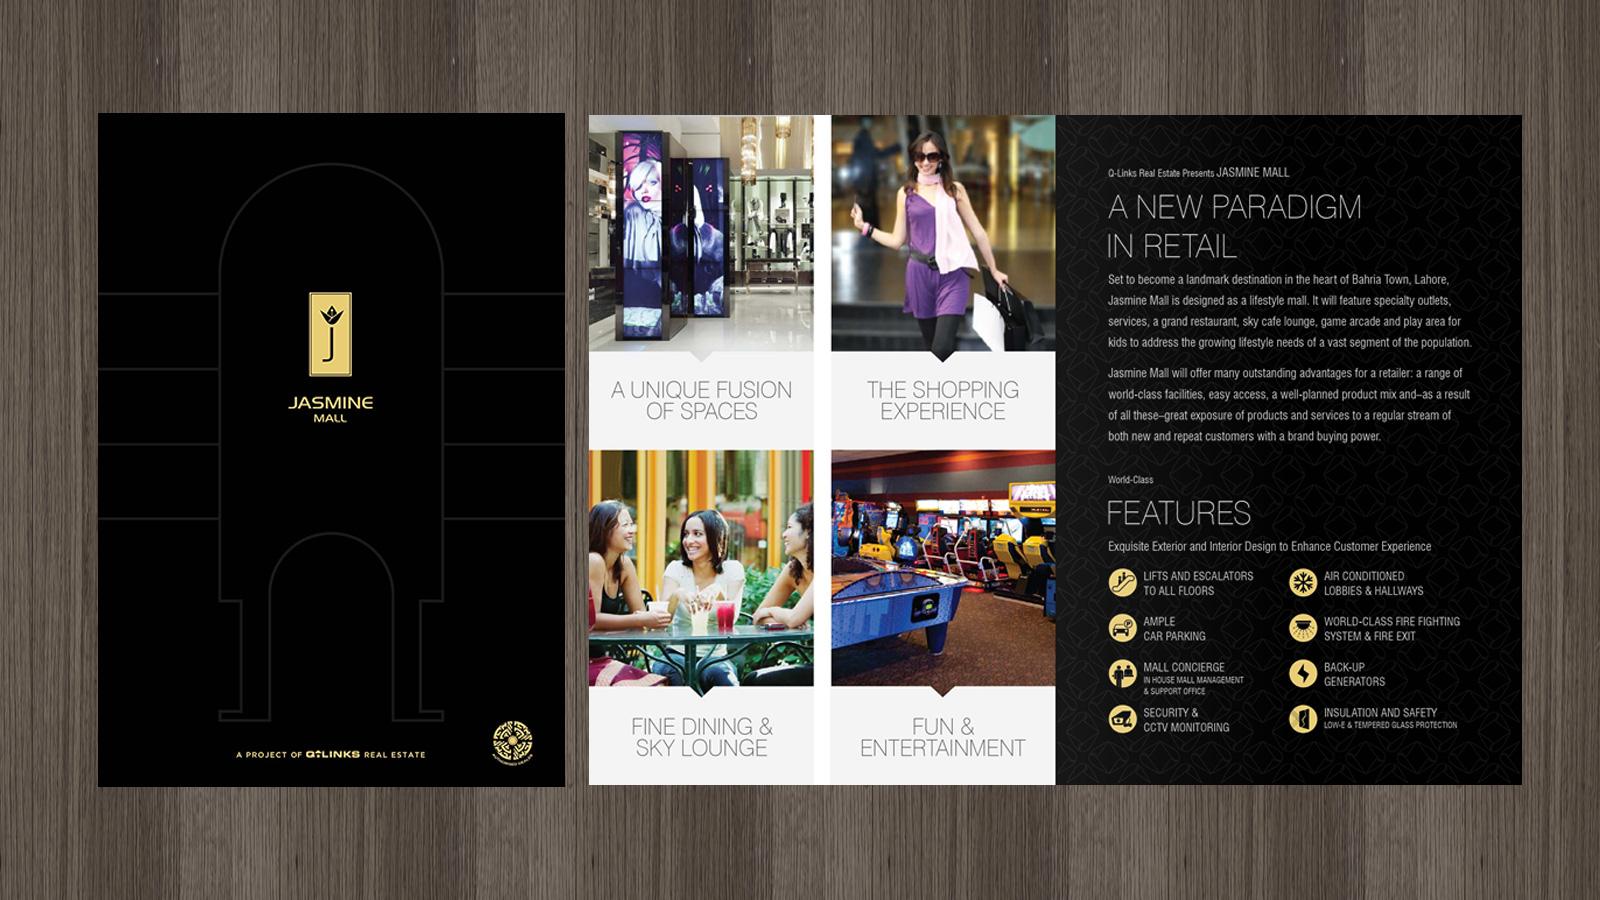 graphic-brand-design-web-designer-hiline-lahore-pakistan-jasmine-mall-003